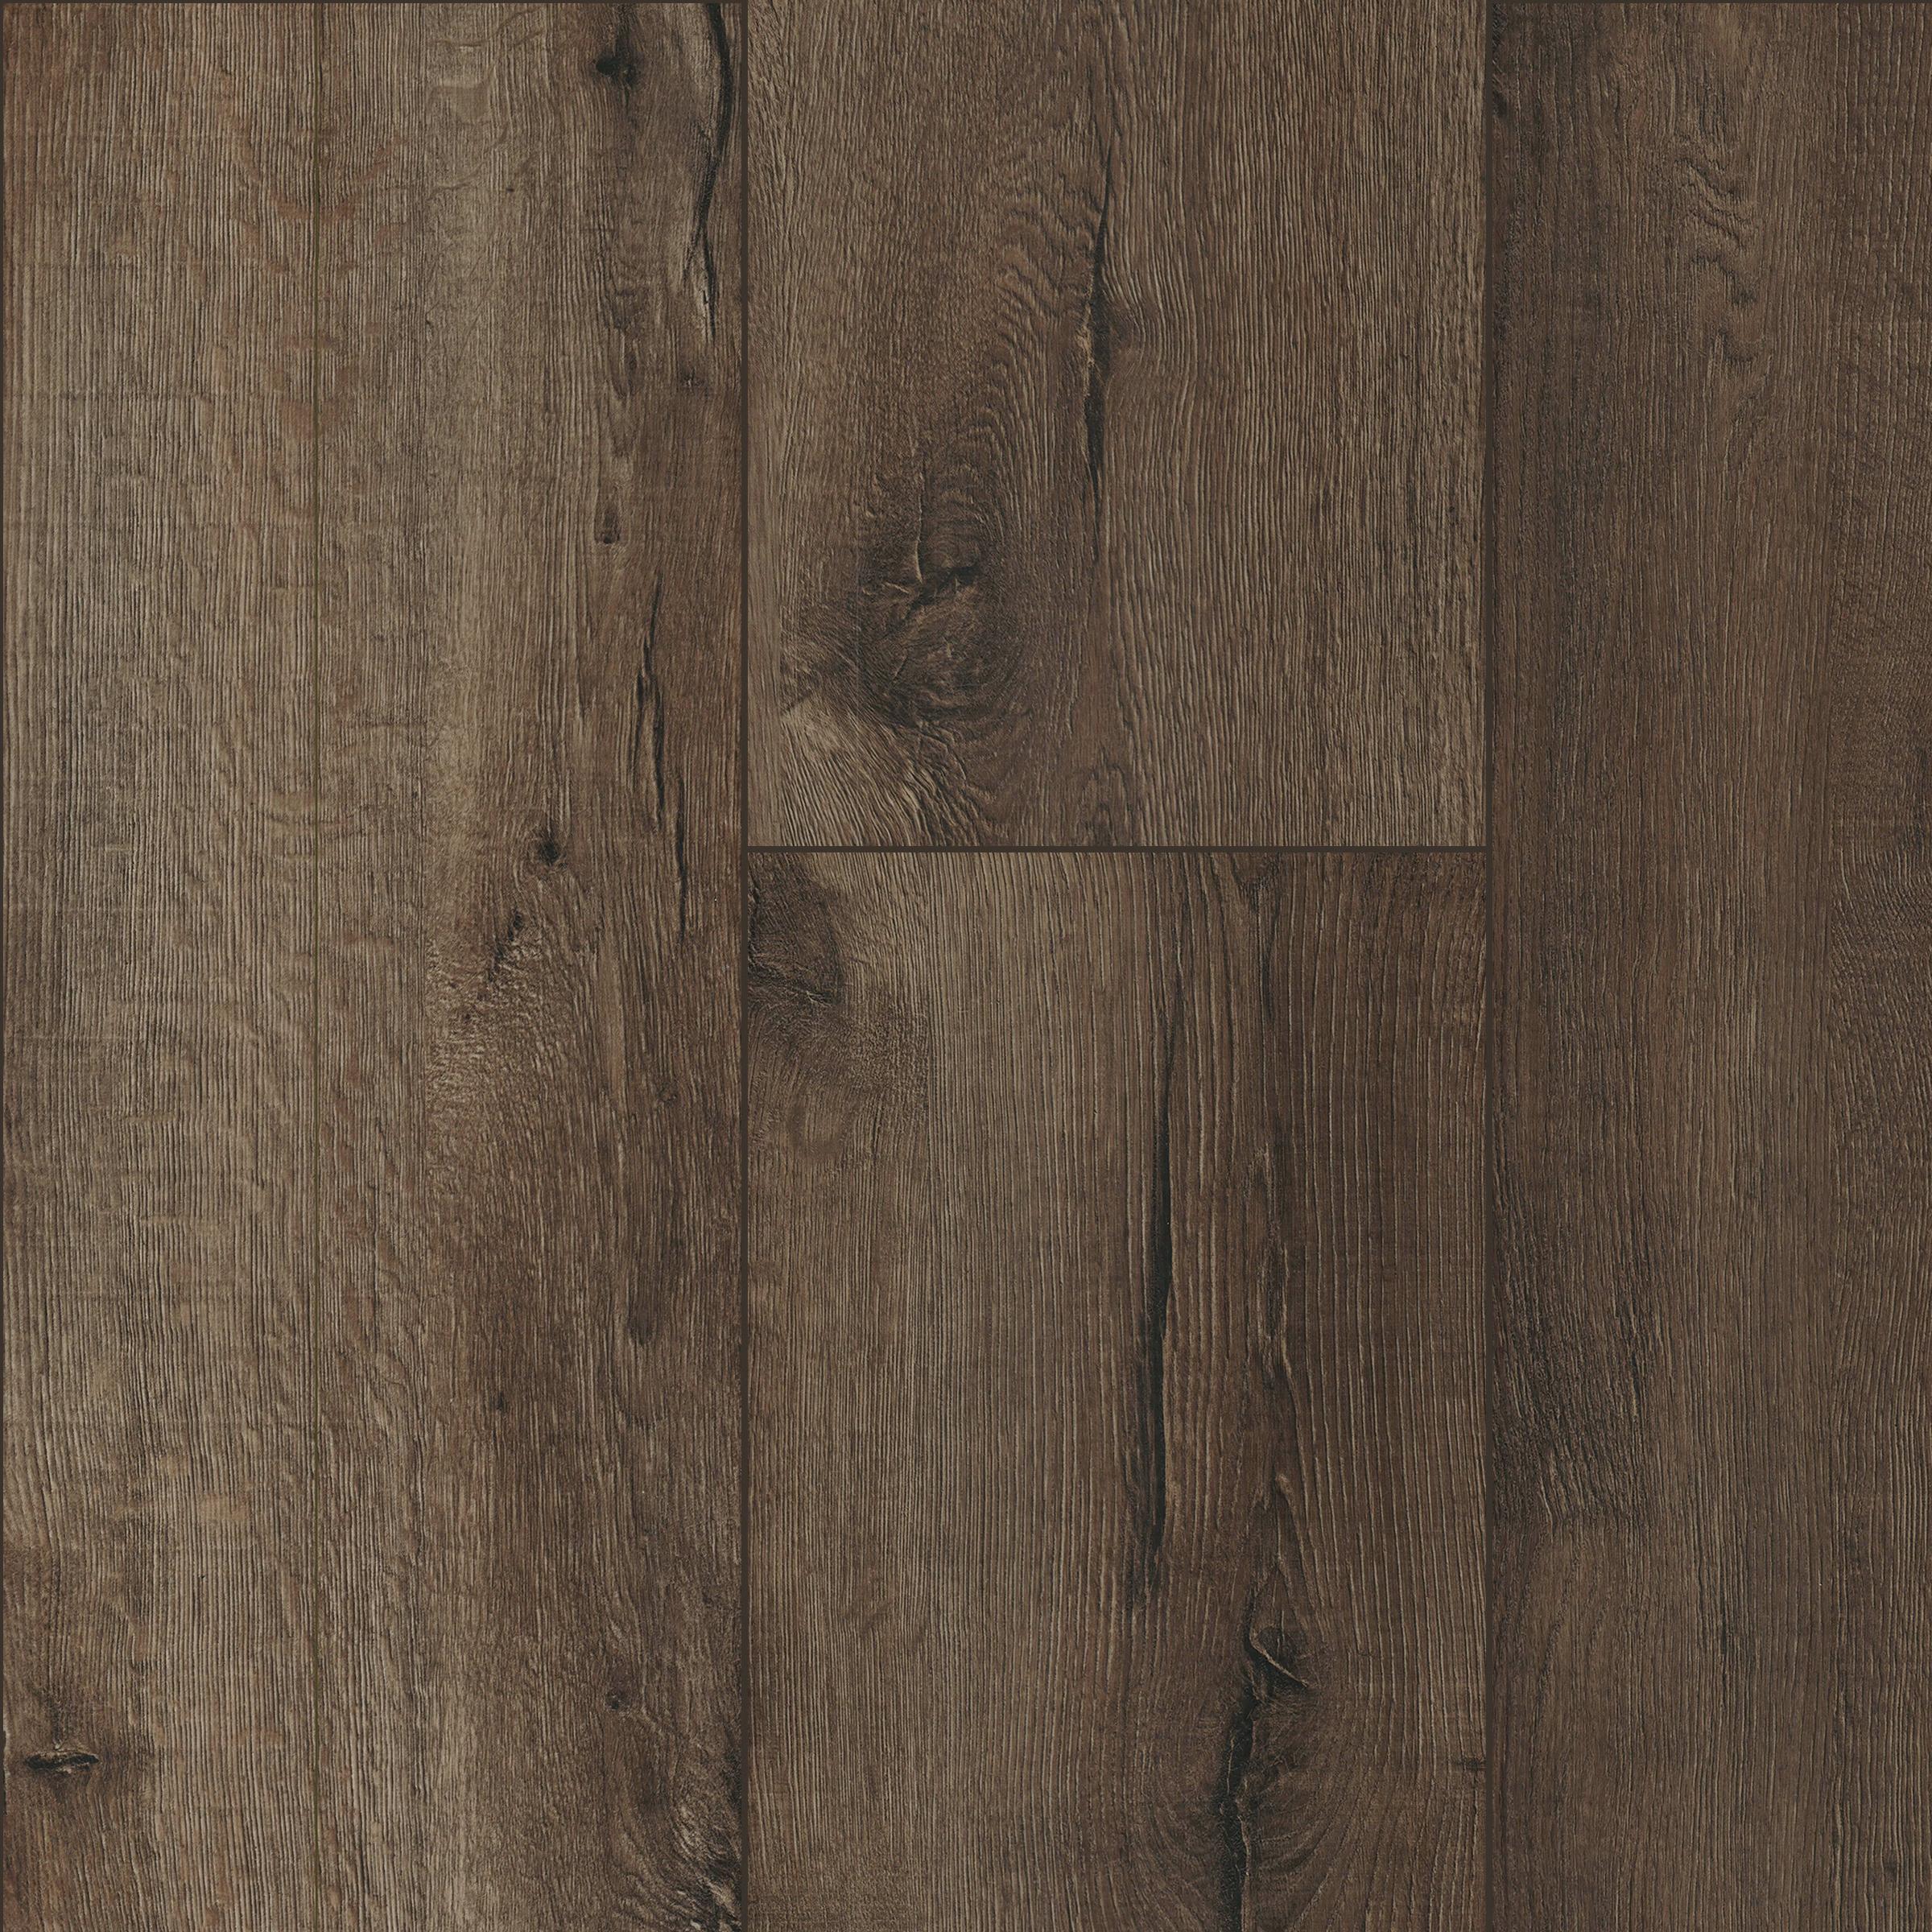 mohawk hardwood floor cleaner of mohawk jefferson hickory 9 wide glue down luxury vinyl plank flooring intended for file 462 14